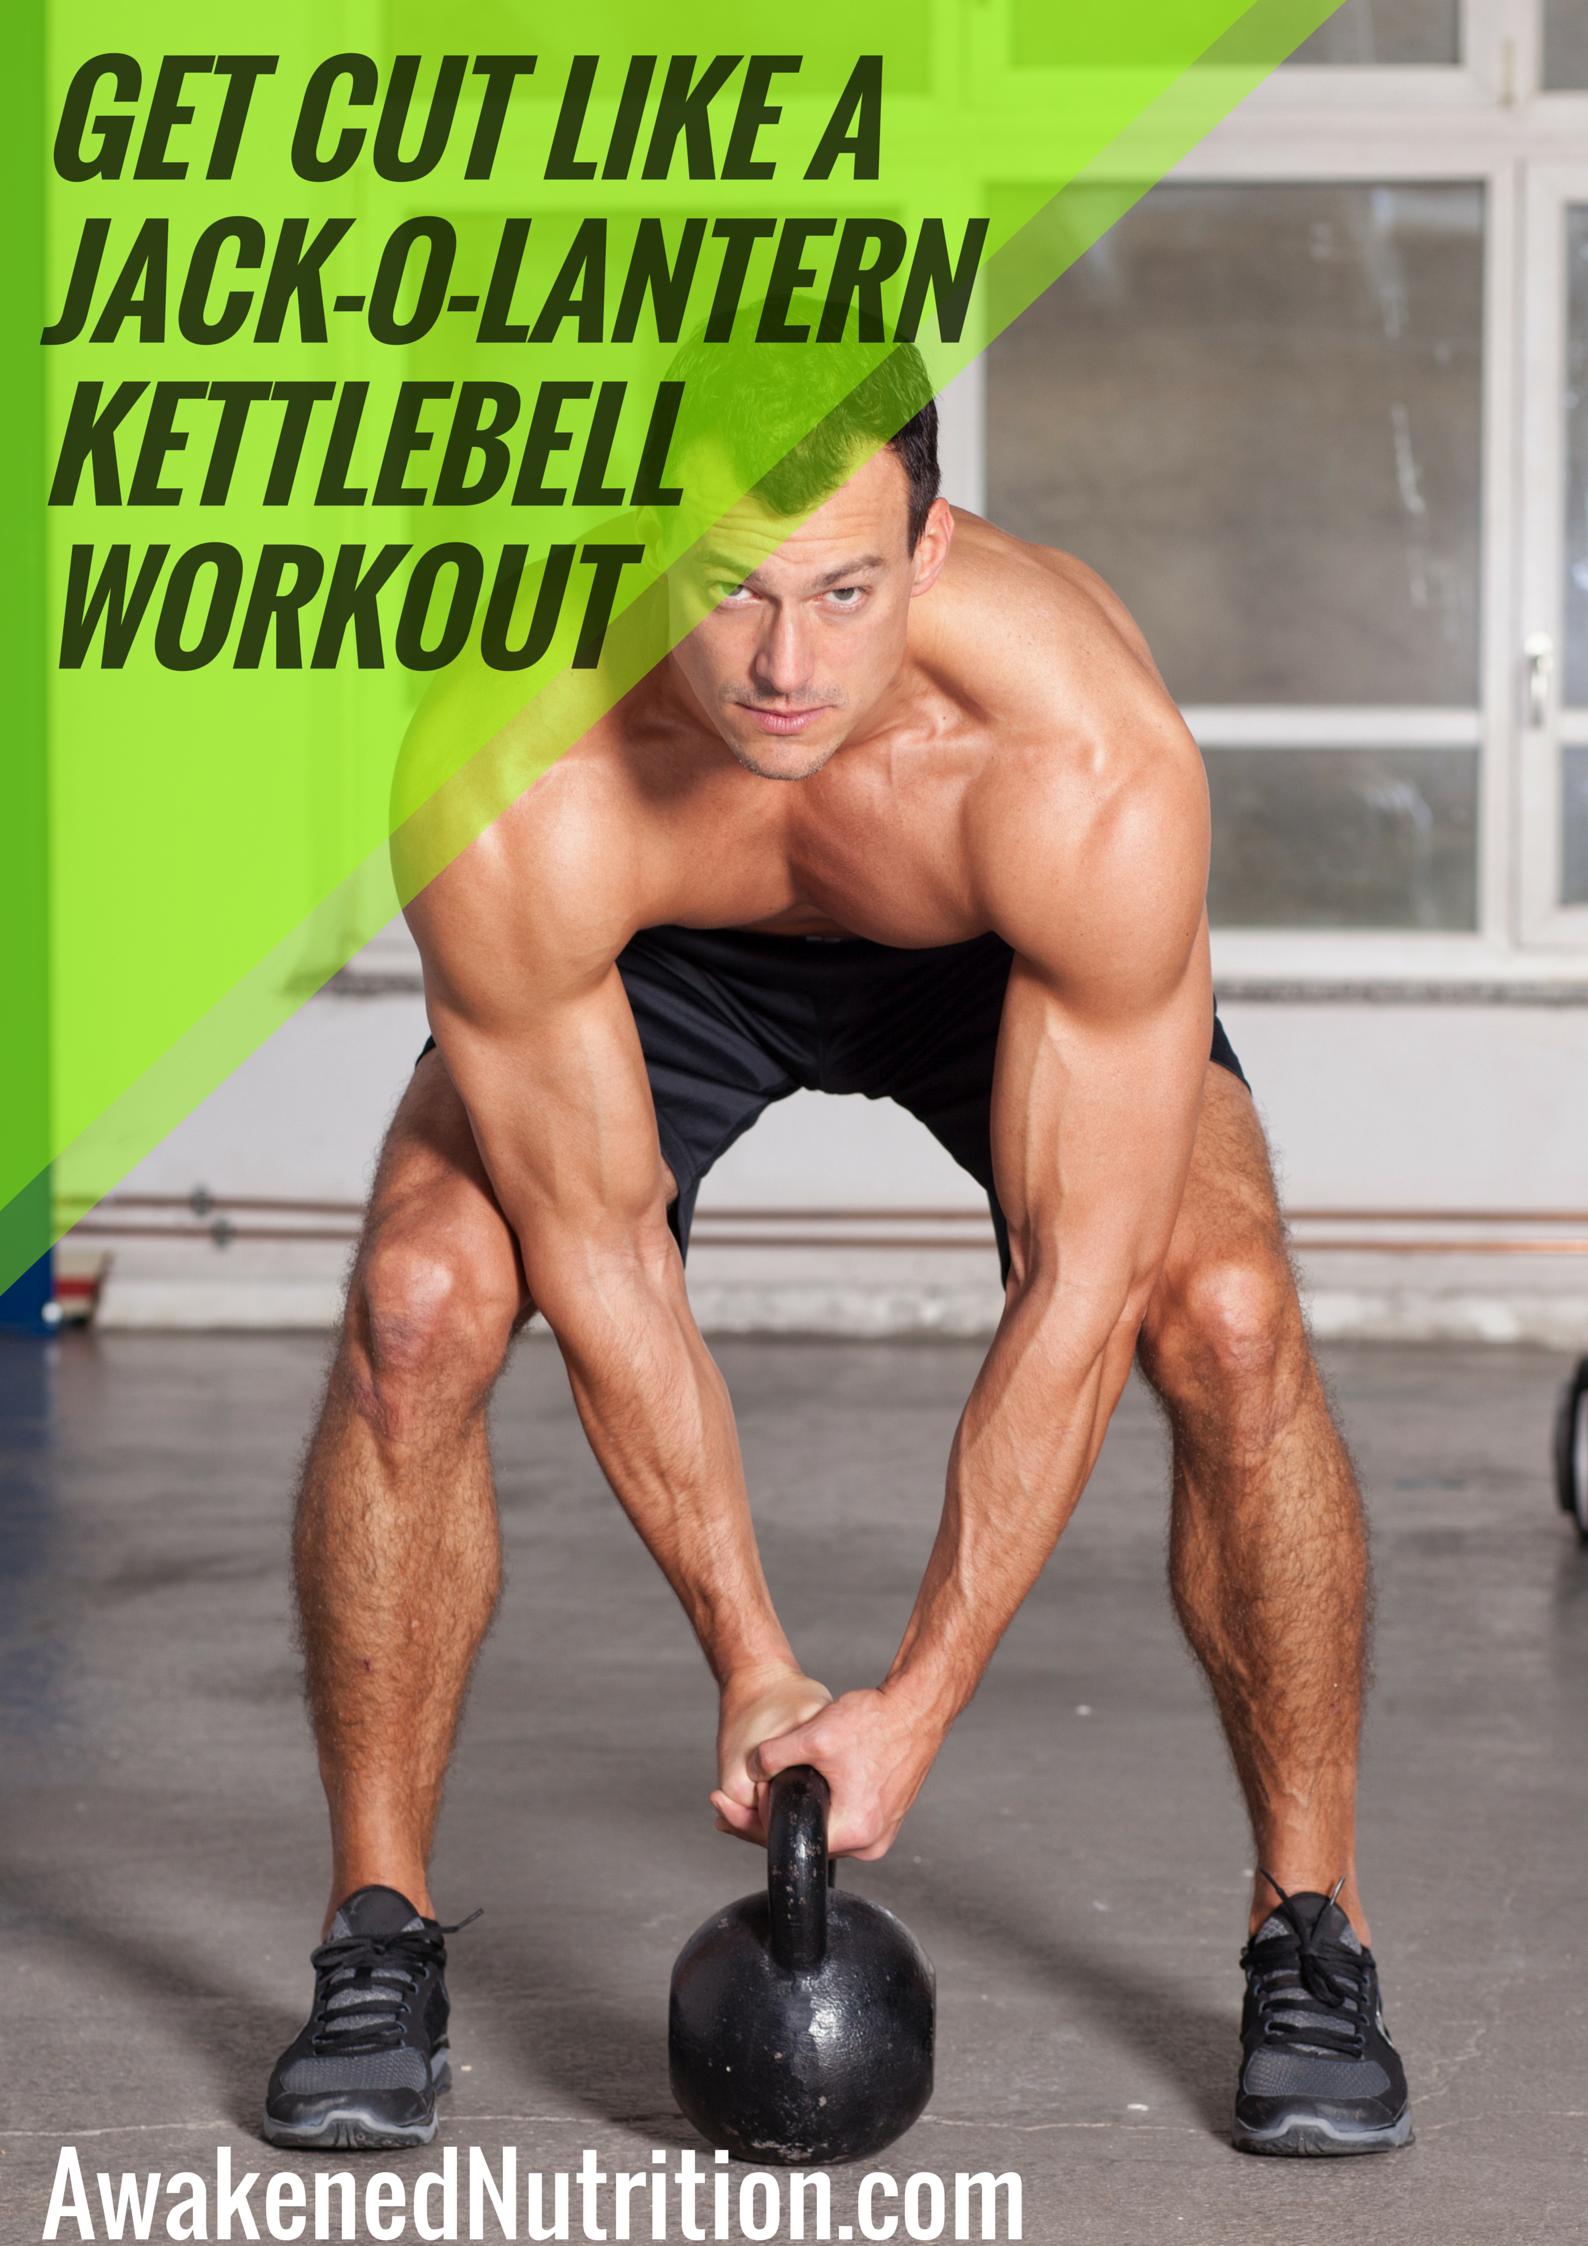 Get cut like a Jack-O-lantern kettlebell workout